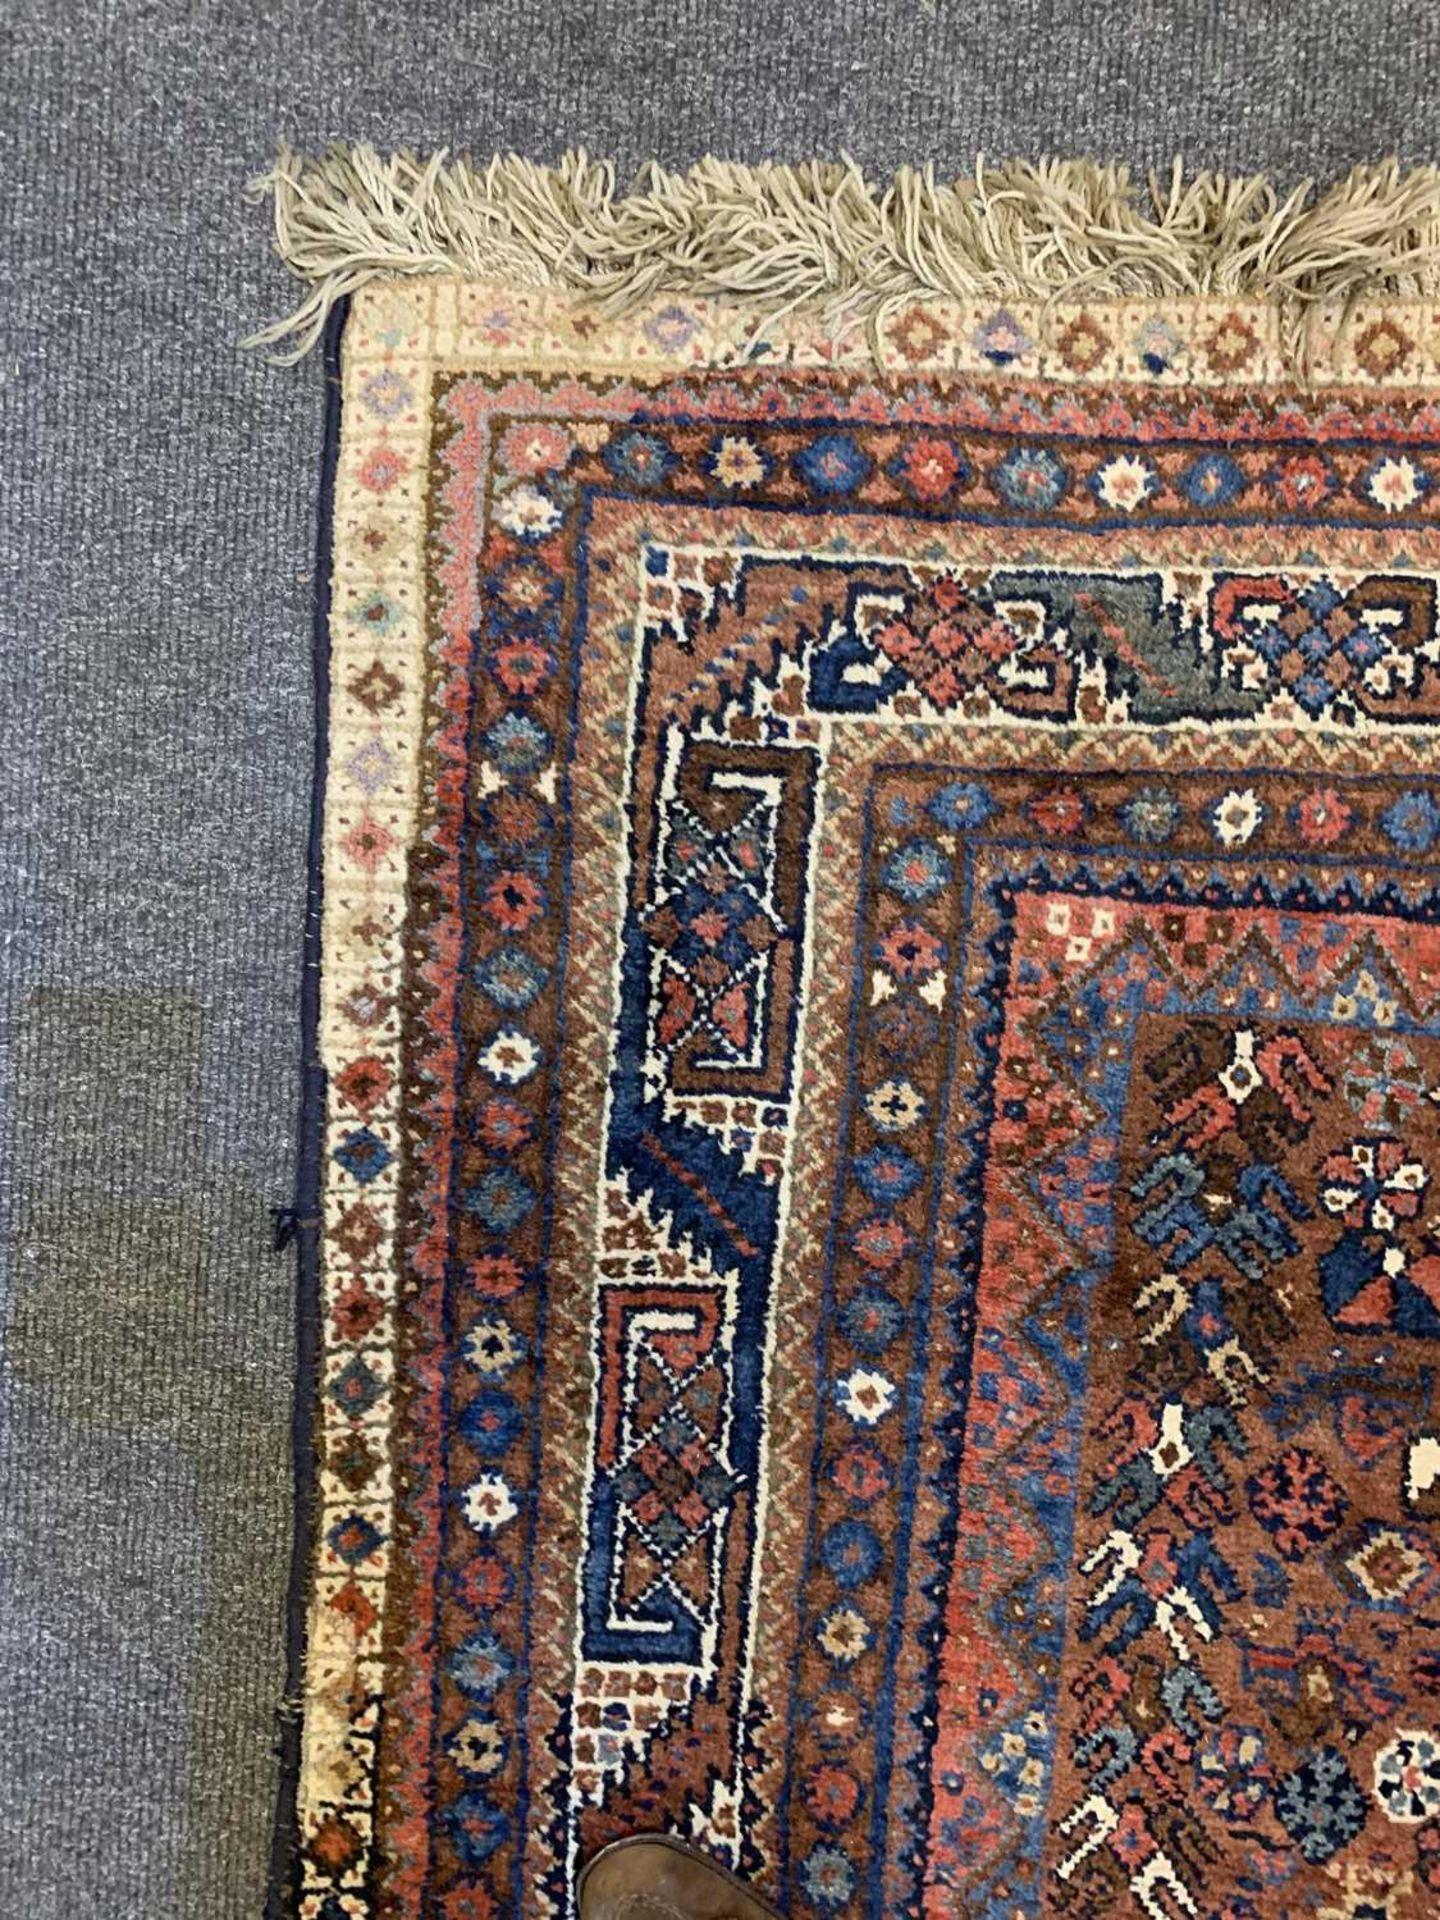 A South West Persian Khamseh carpet, - Image 15 of 17